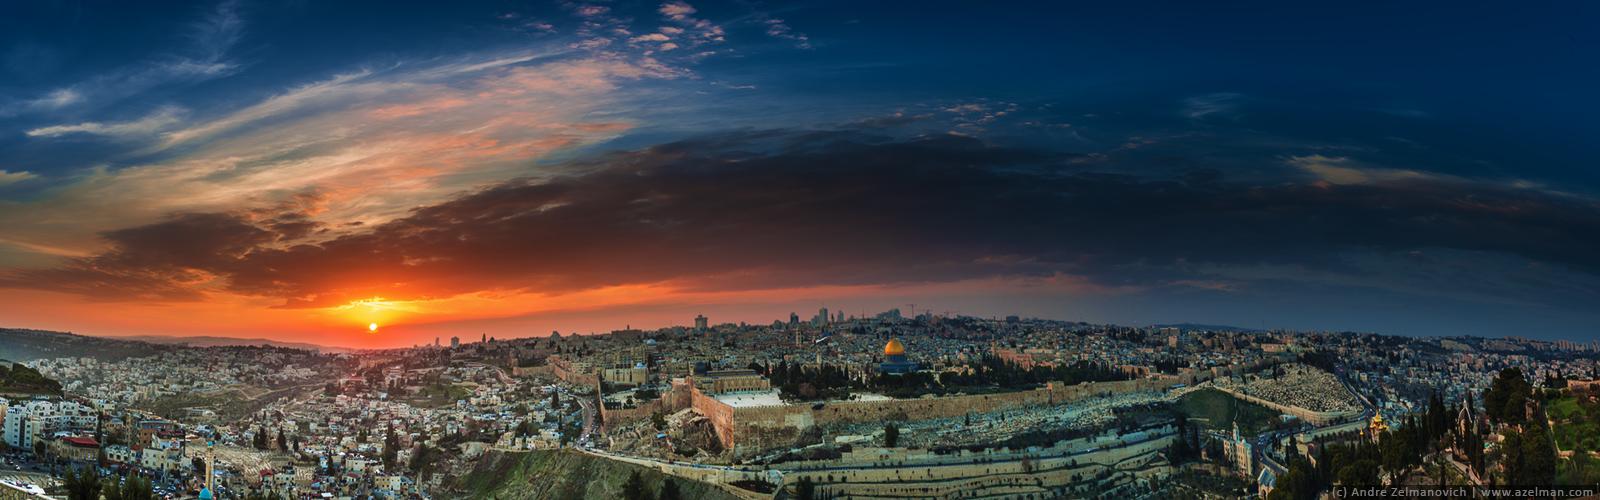 jerusalem-pano_2_1600